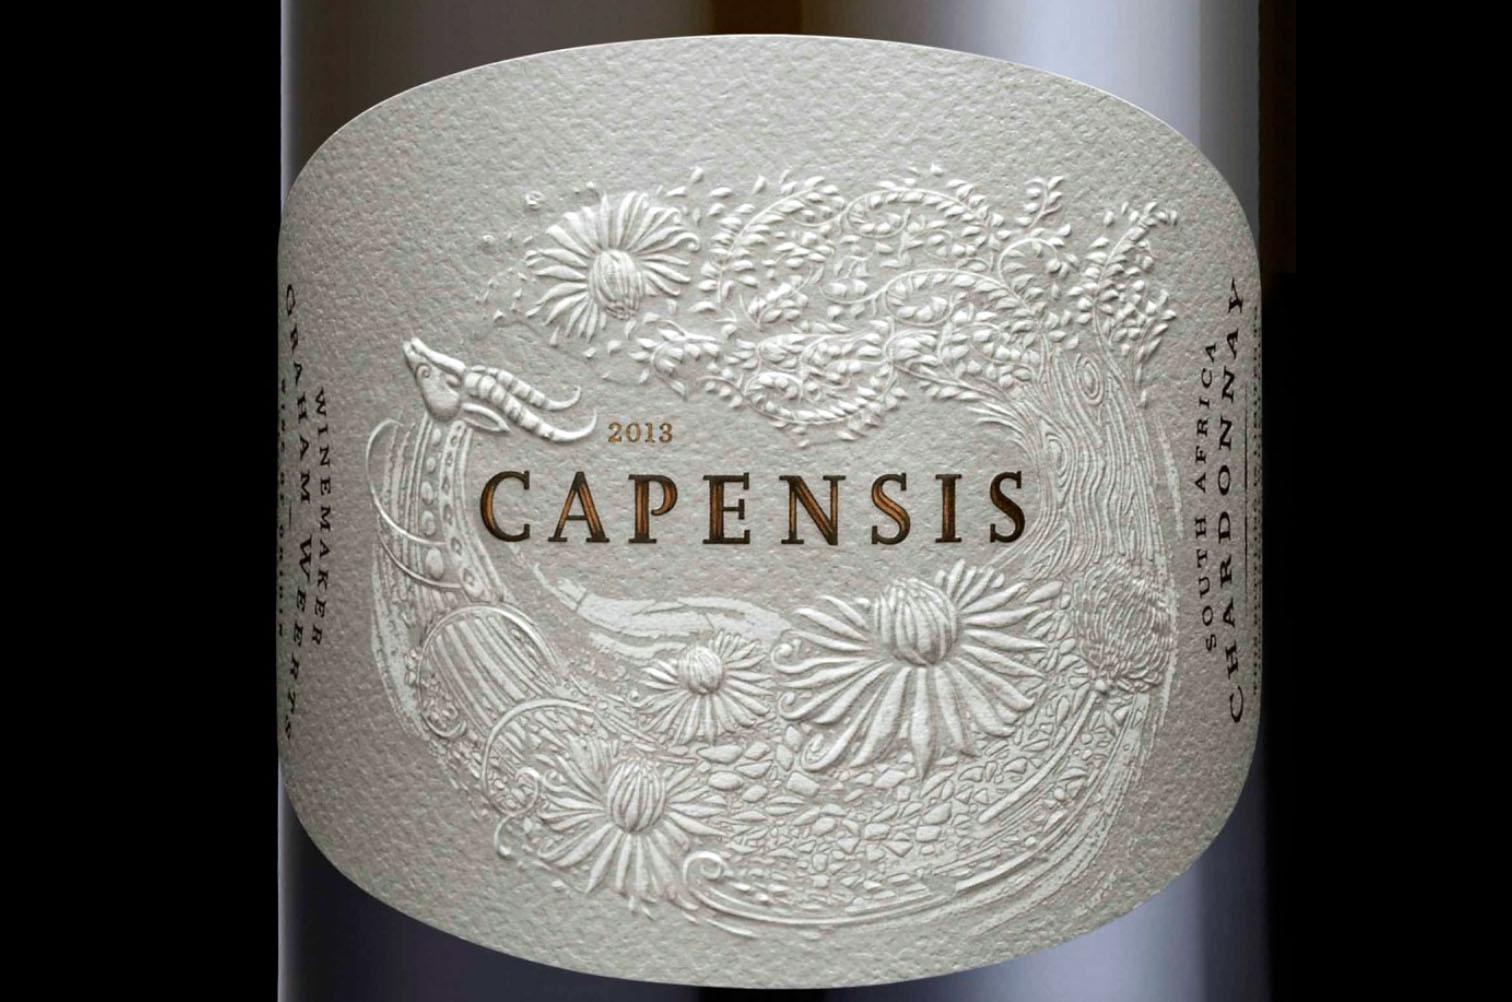 capensis_label